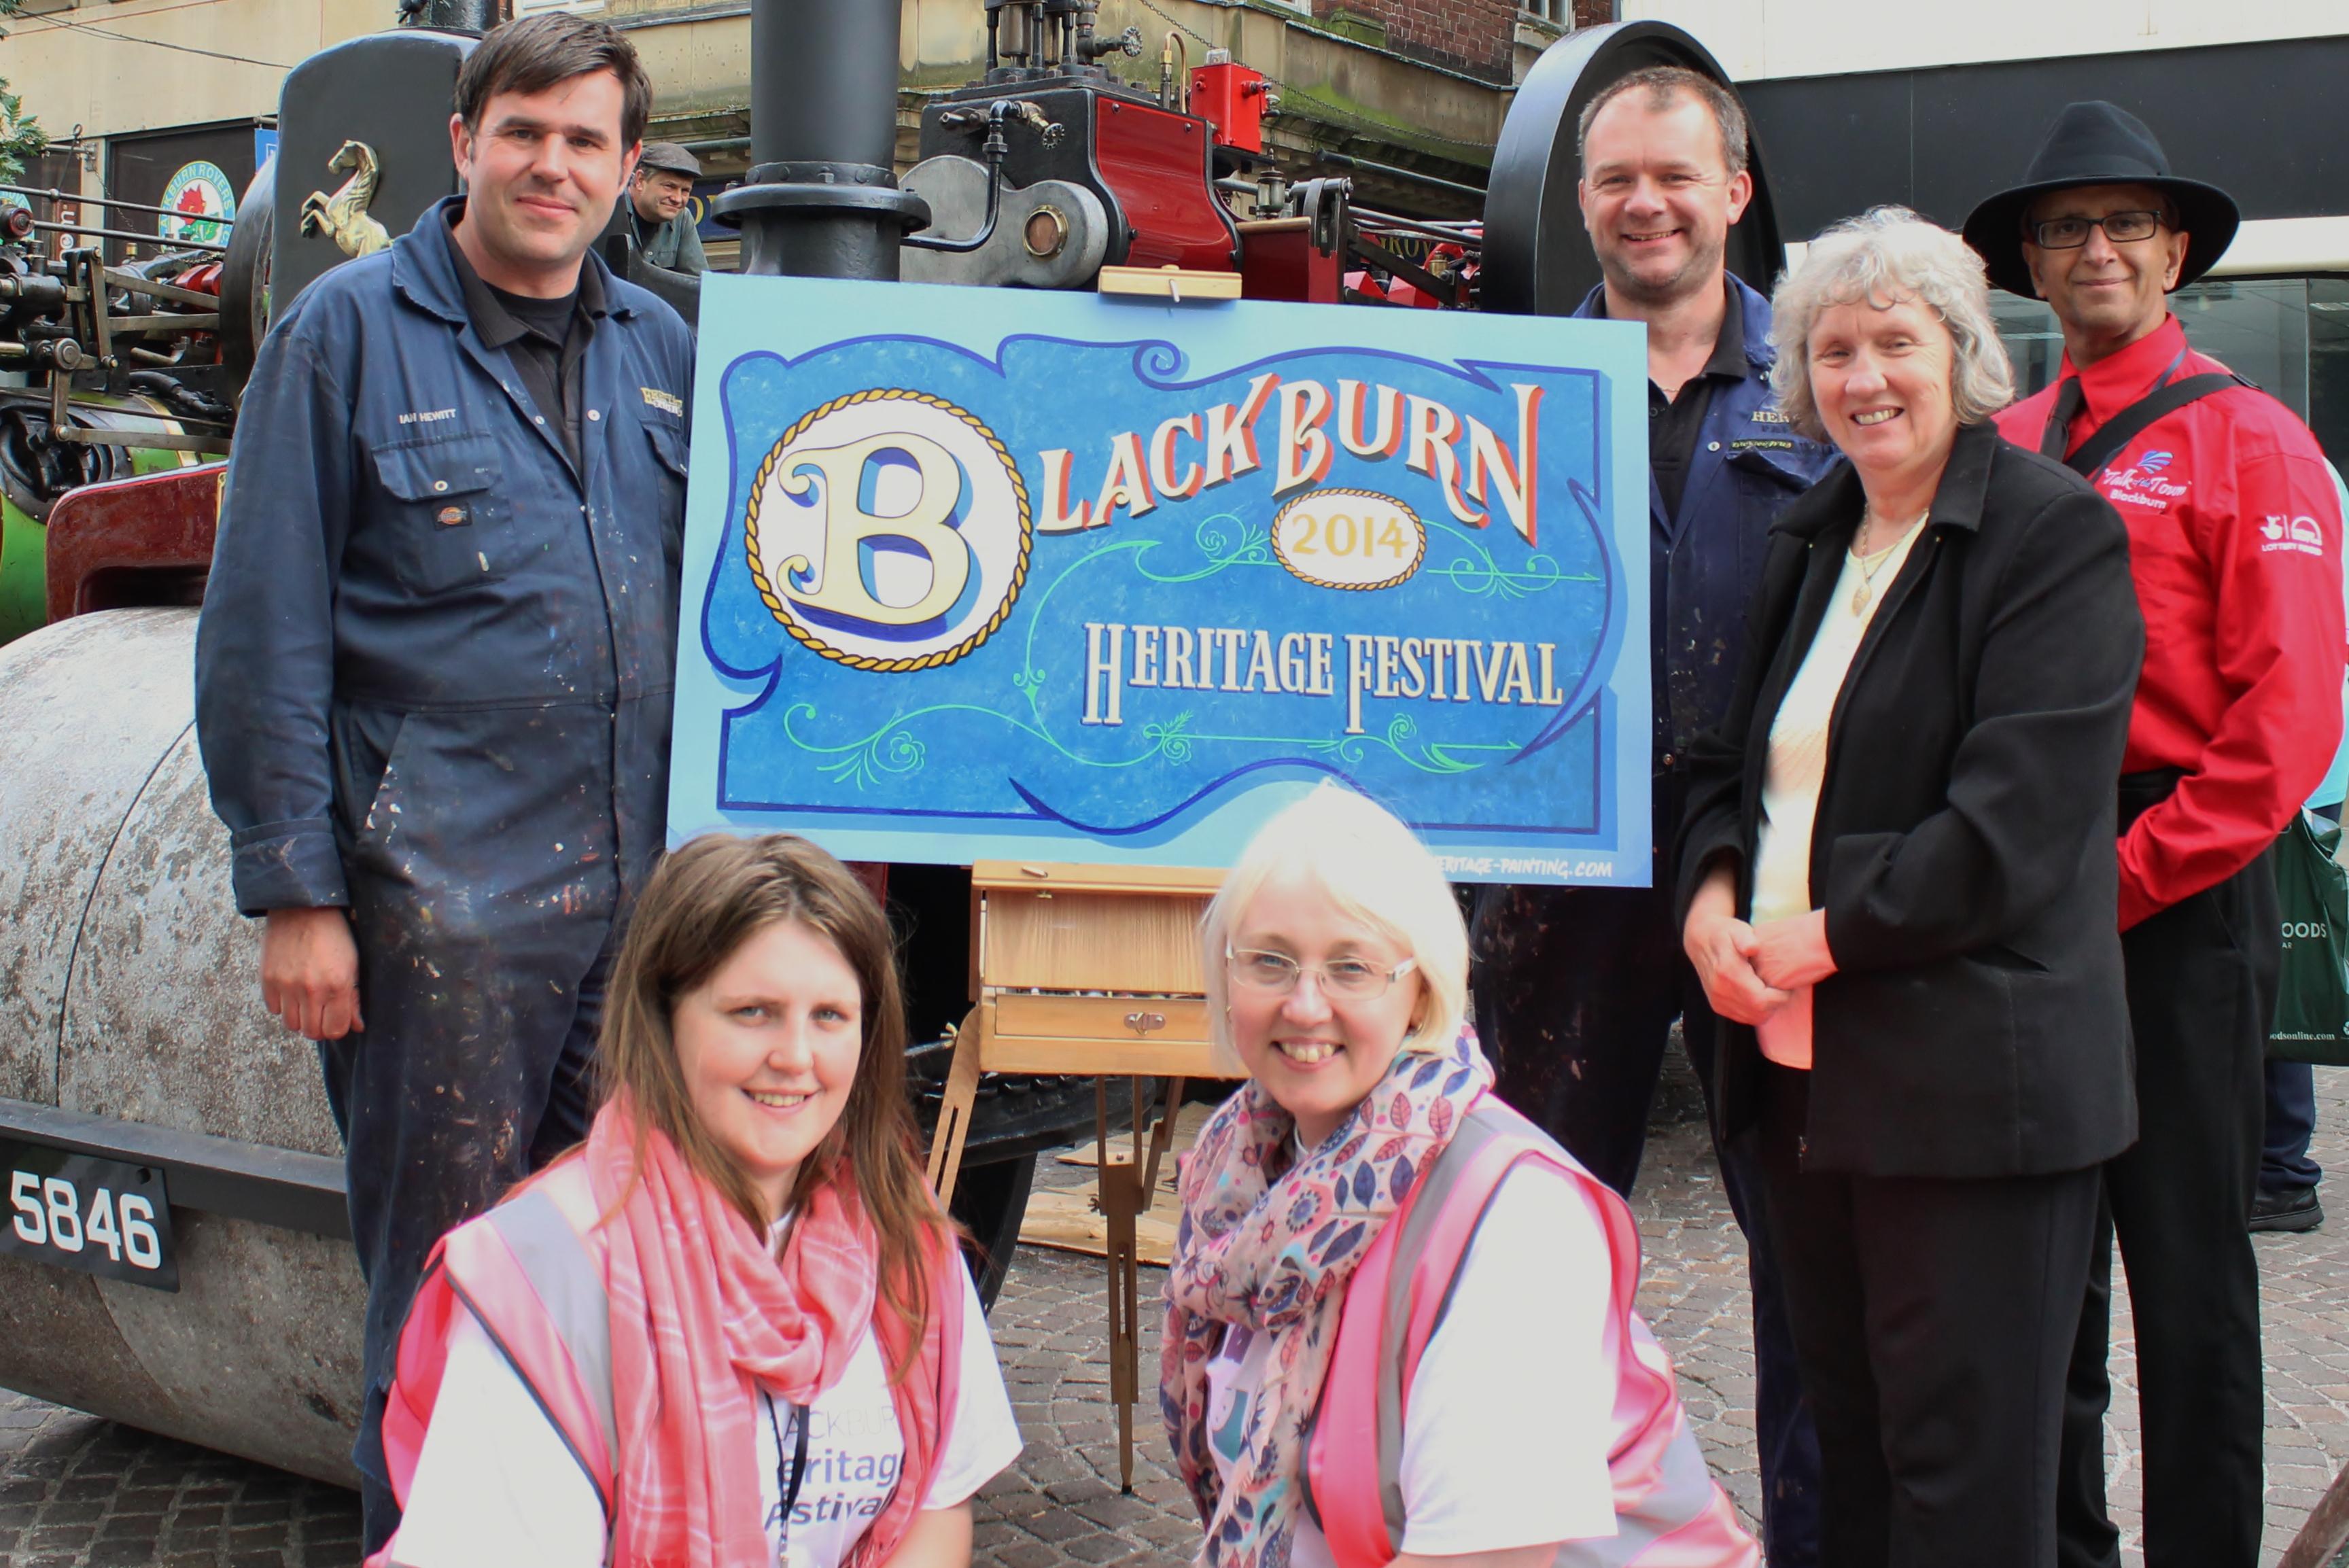 What's On in Blackburn